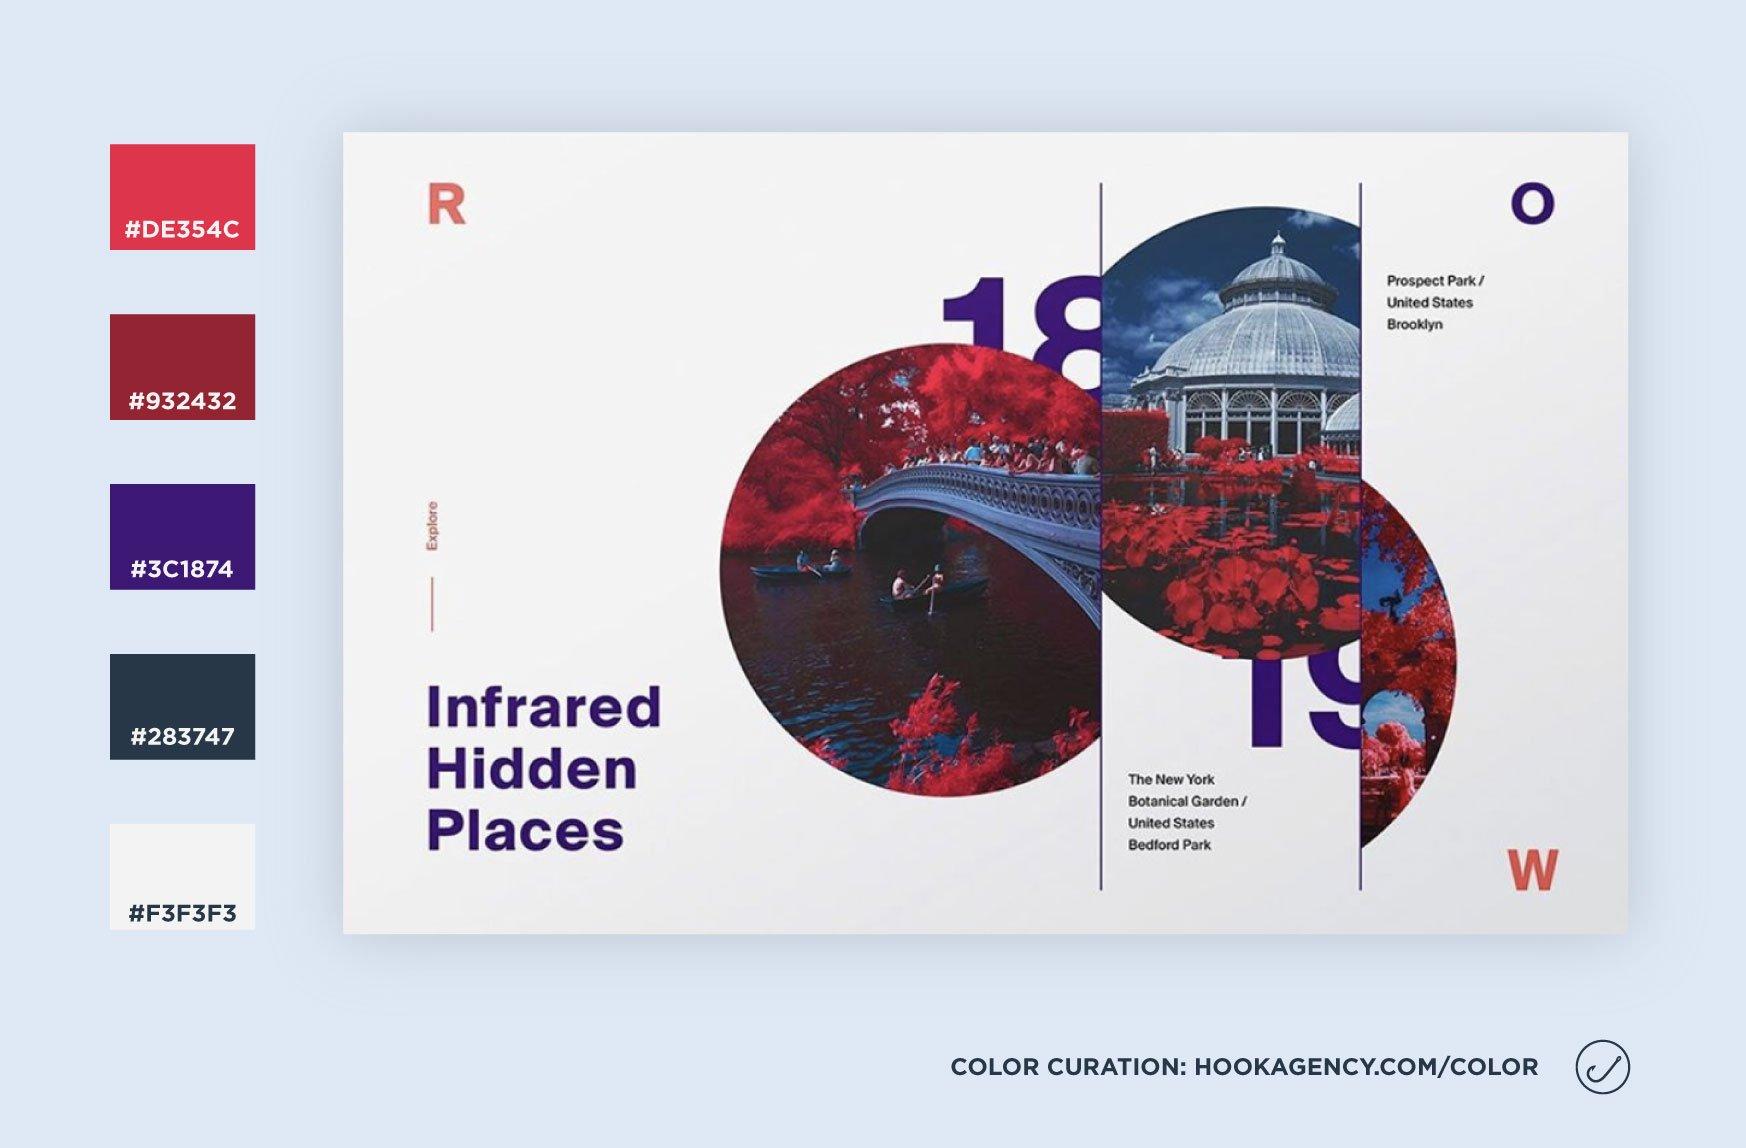 Red and Purple Color Scheme 2021 - Website color schemes inspiration, Dribbble, Pinterest, Behance